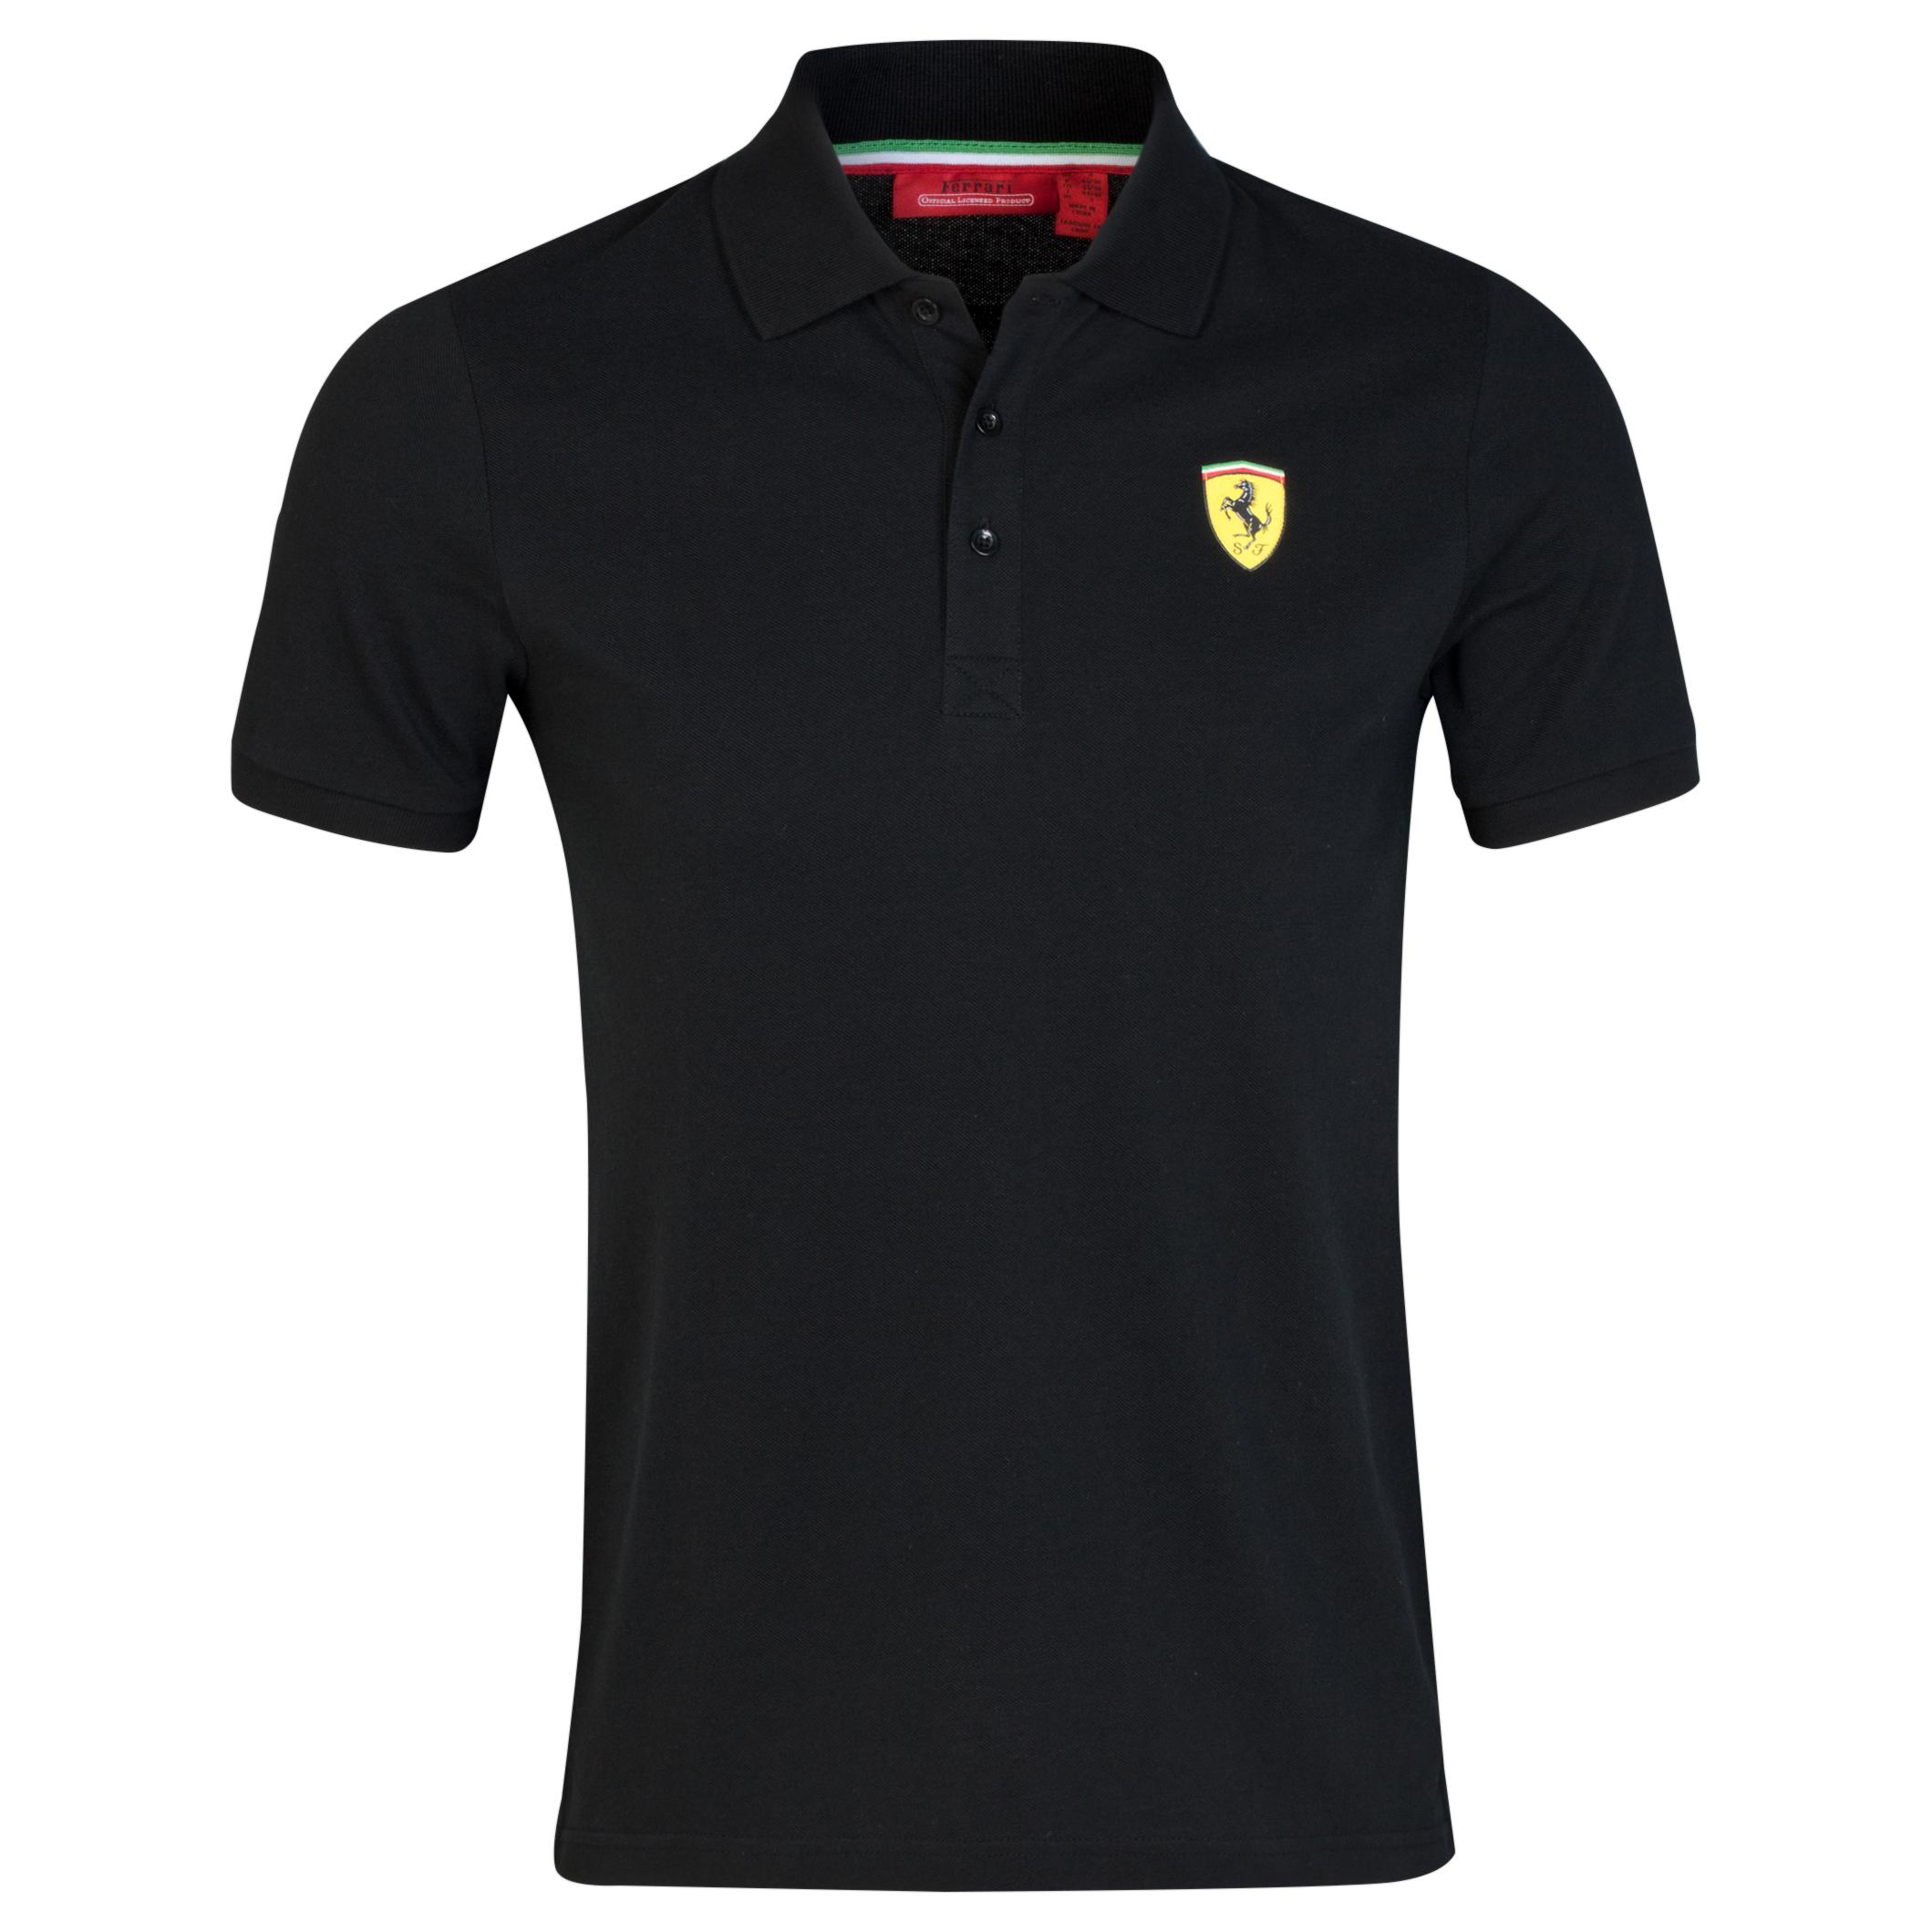 Scuderia Ferrari Mens Classic Polo Shirt Black